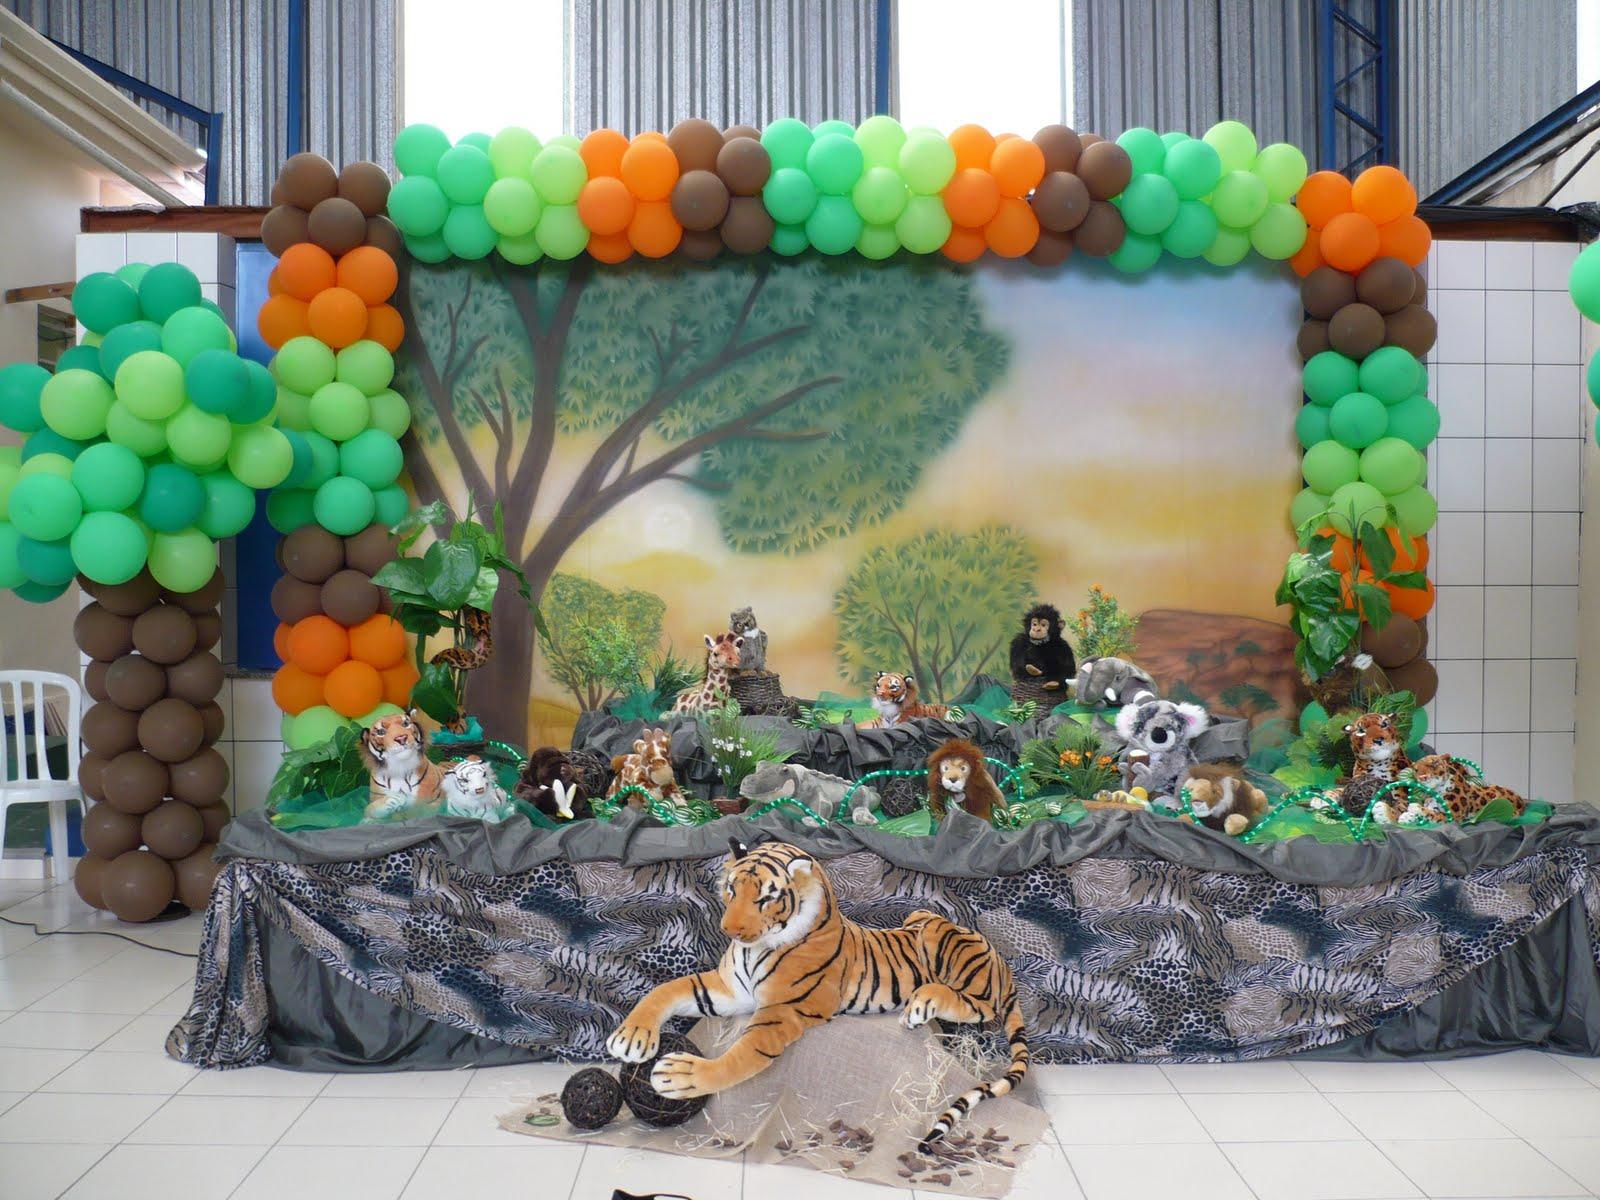 decoracao festa safari:Hollybaby Decorações de Festas Infantis: Safari / Floresta